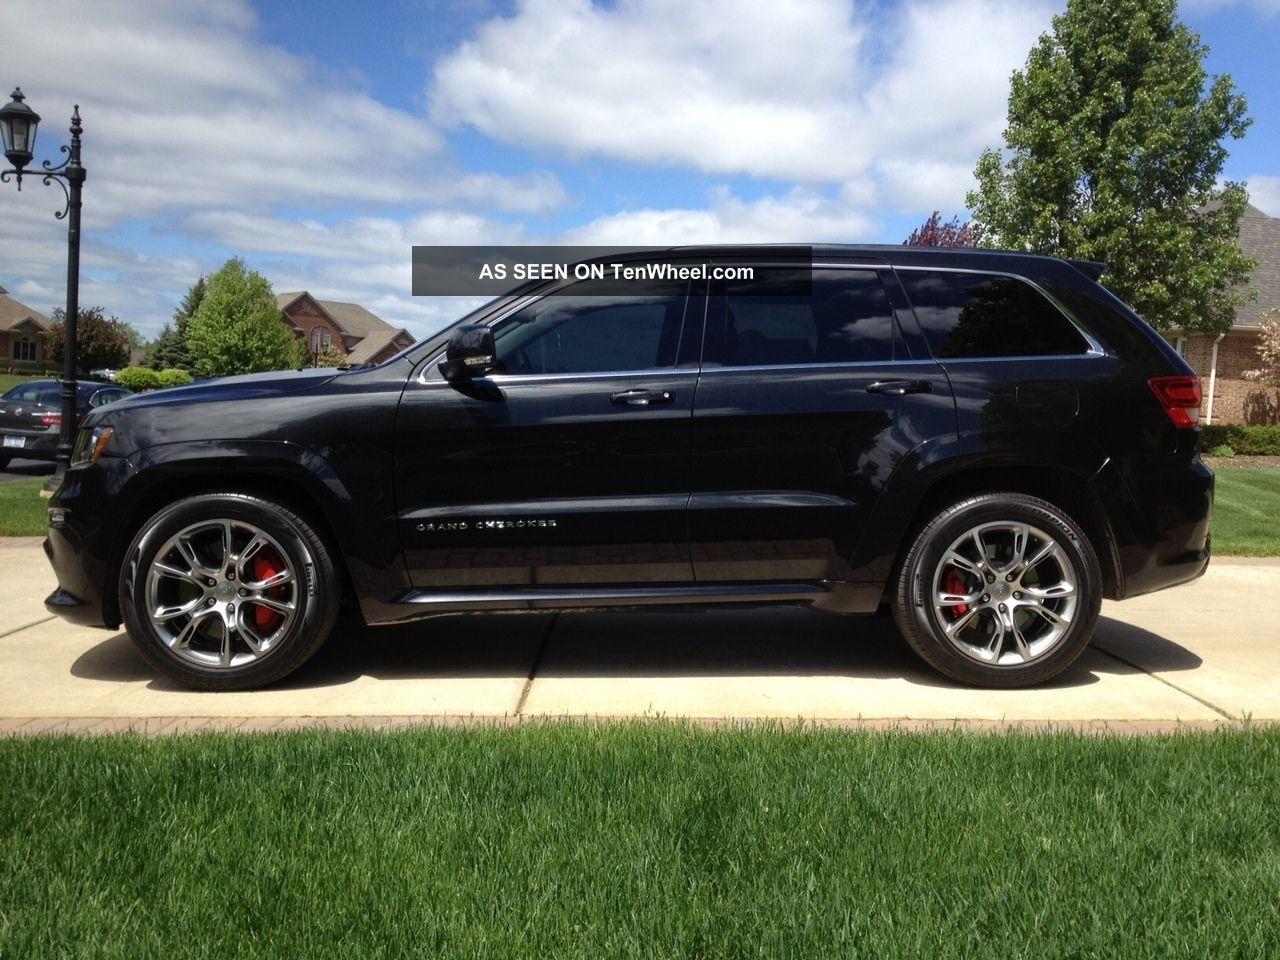 2012 jeep grand cherokee srt 8 grand cherokee photo 1. Black Bedroom Furniture Sets. Home Design Ideas